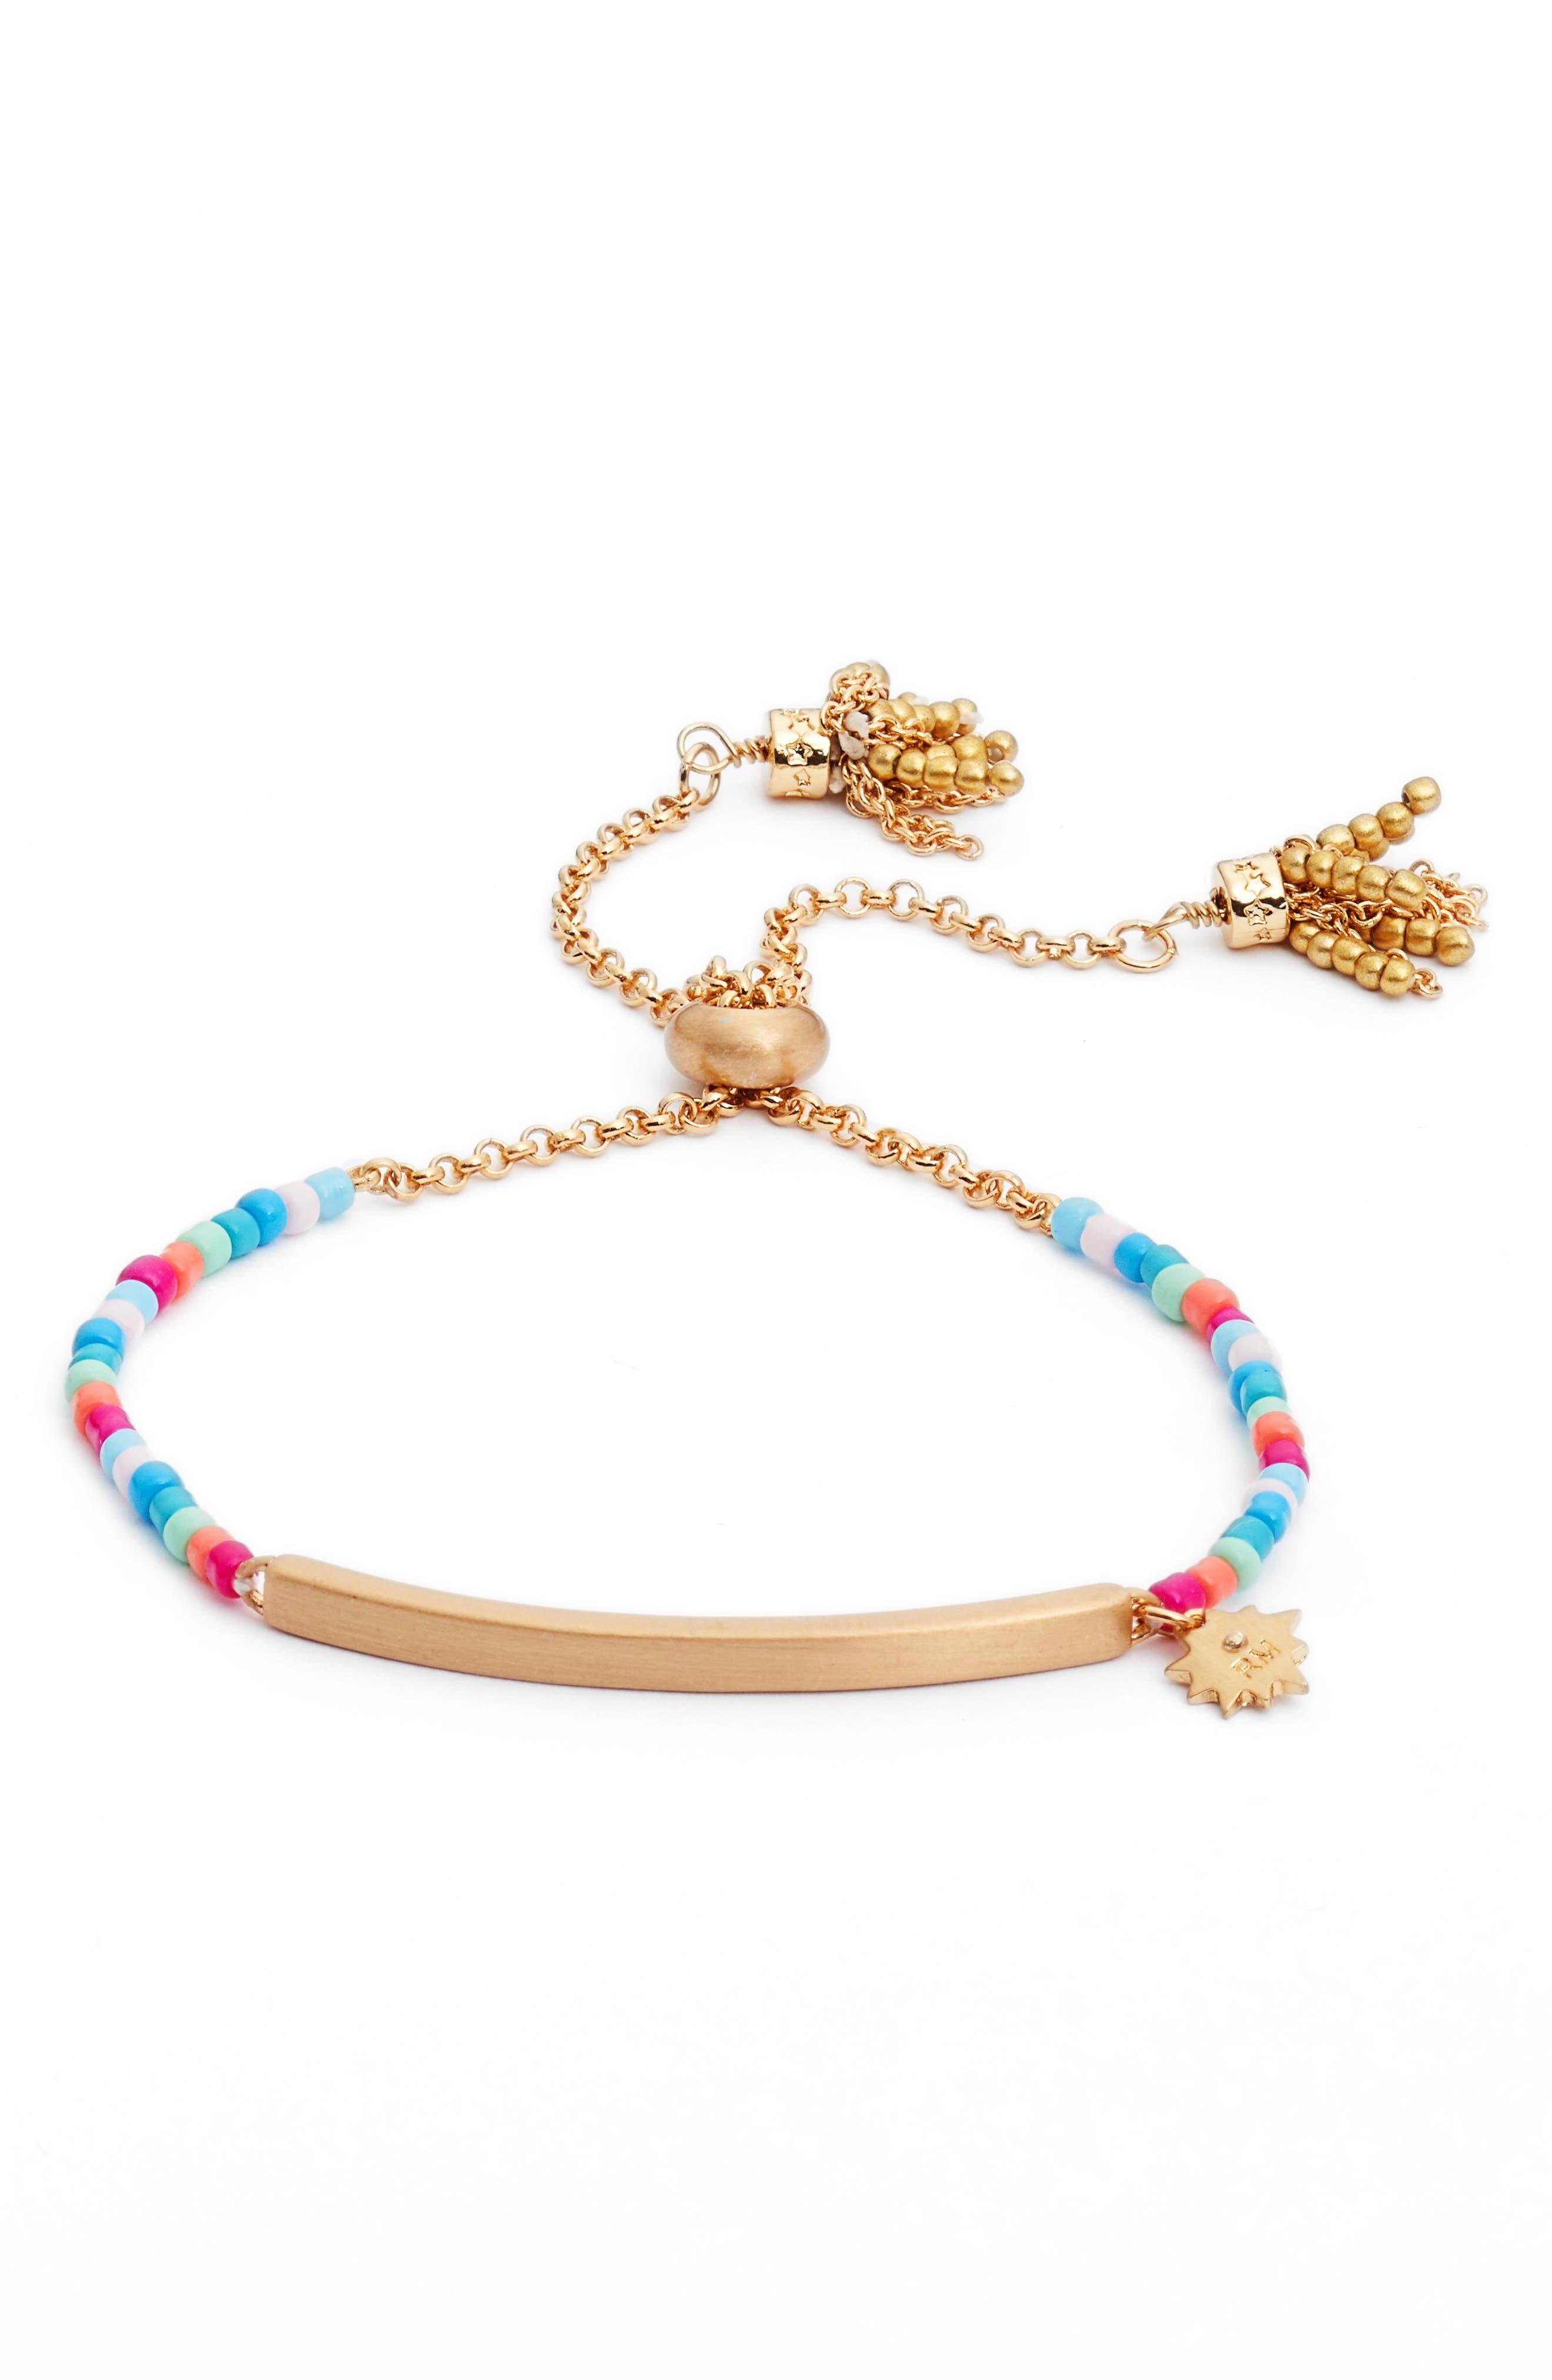 Sole Beaded Adjustable Bracelet,                         Main,                         color, 710